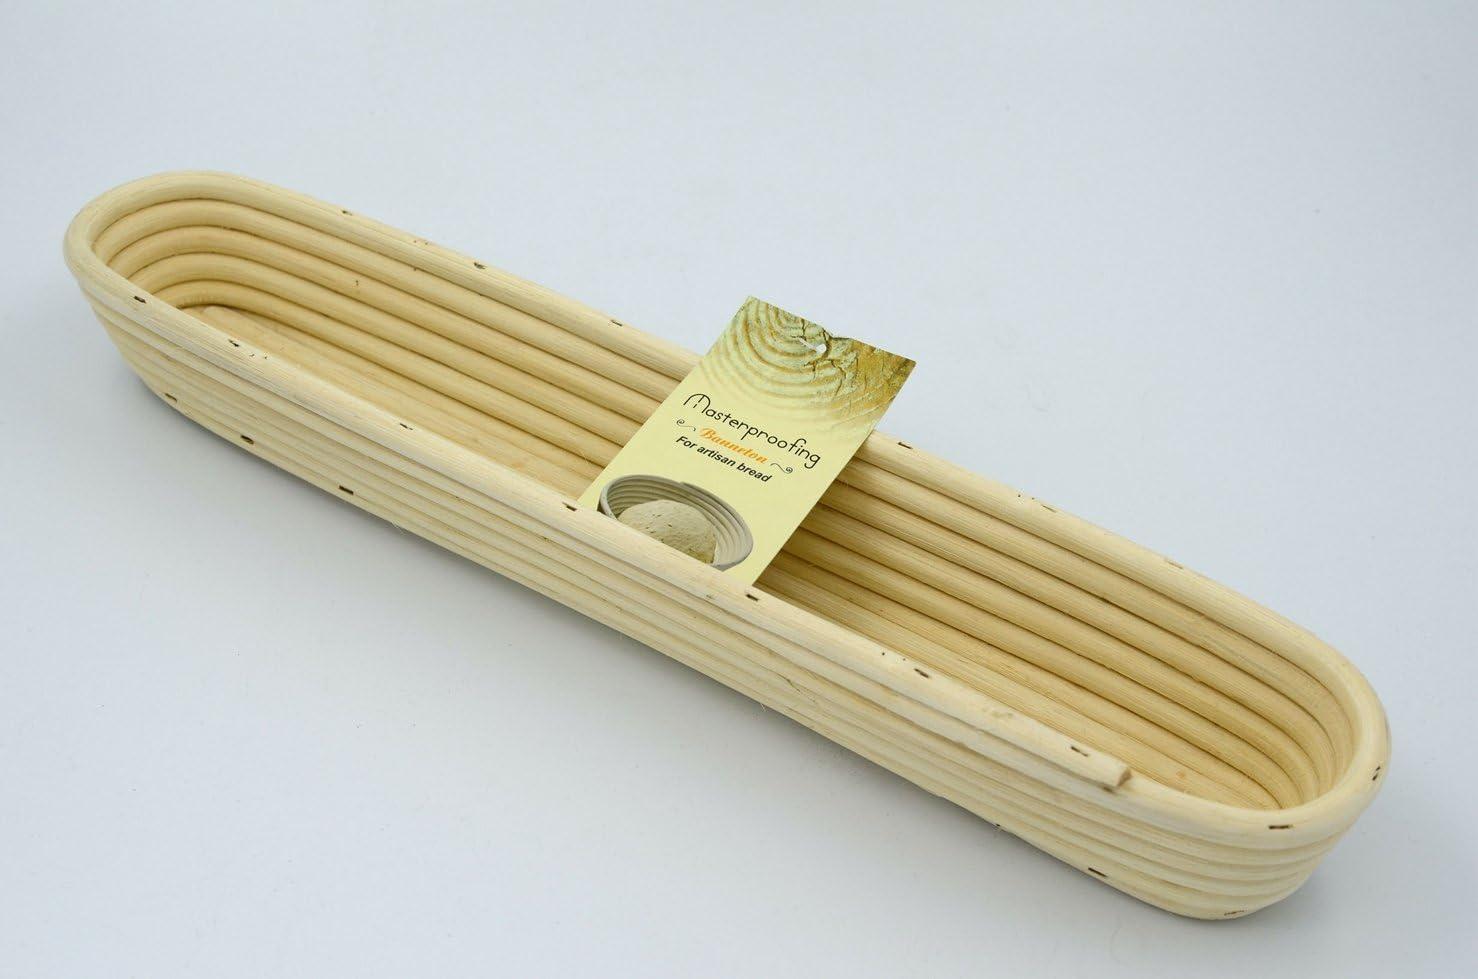 2 Pcs Masterproofing Long Banneton Basket- 44*9*5.5cm by Masterproofing